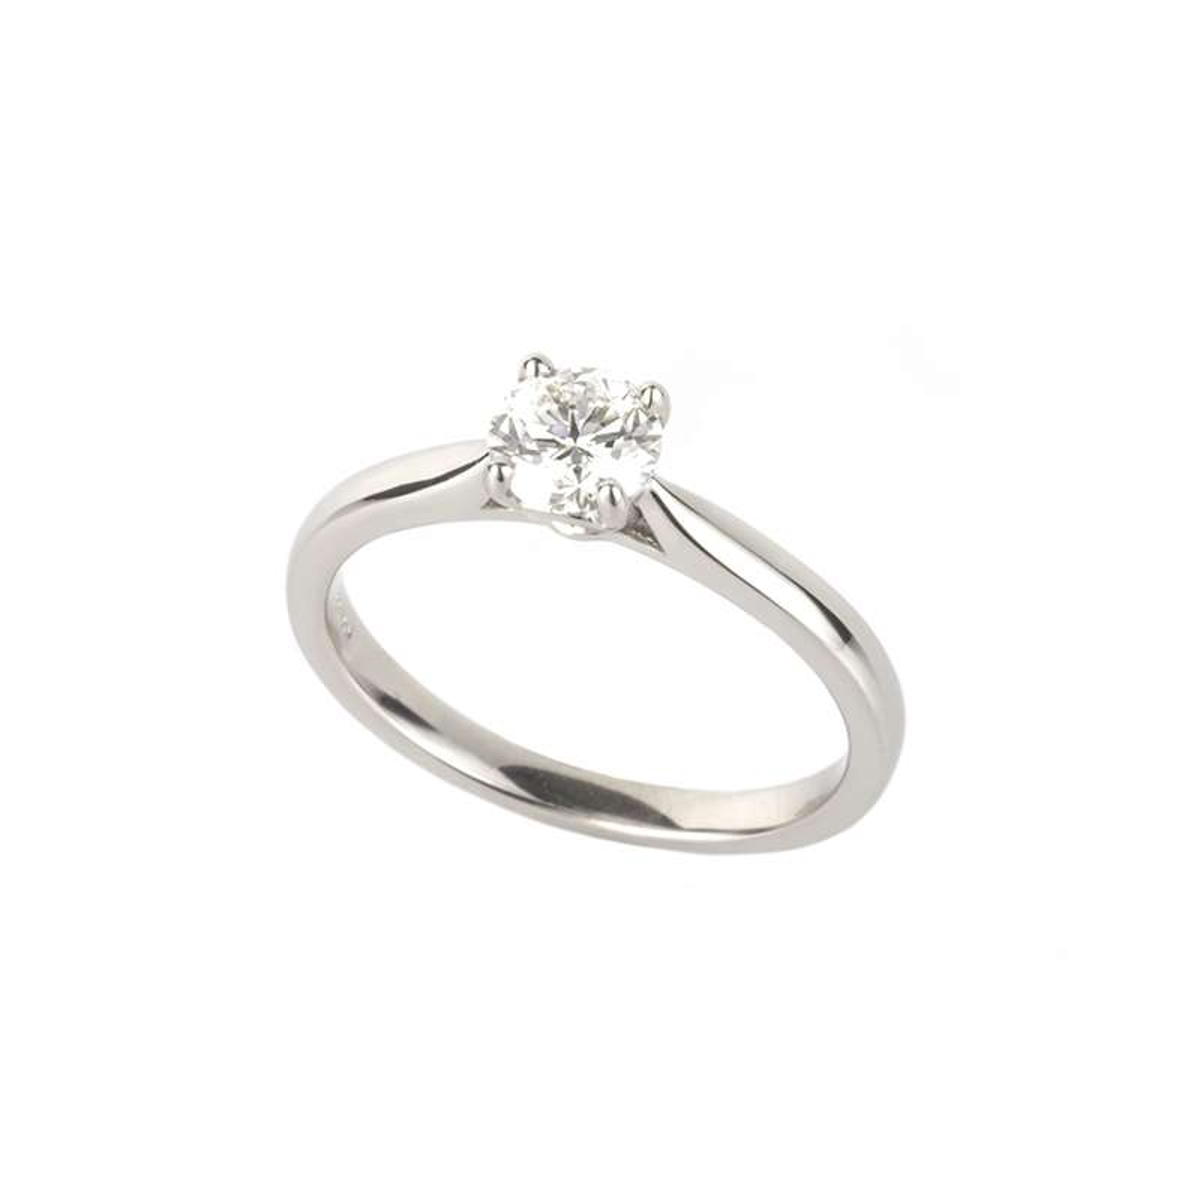 18k White Gold Round Brilliant Cut Diamond Ring 0.59ct H/VS2